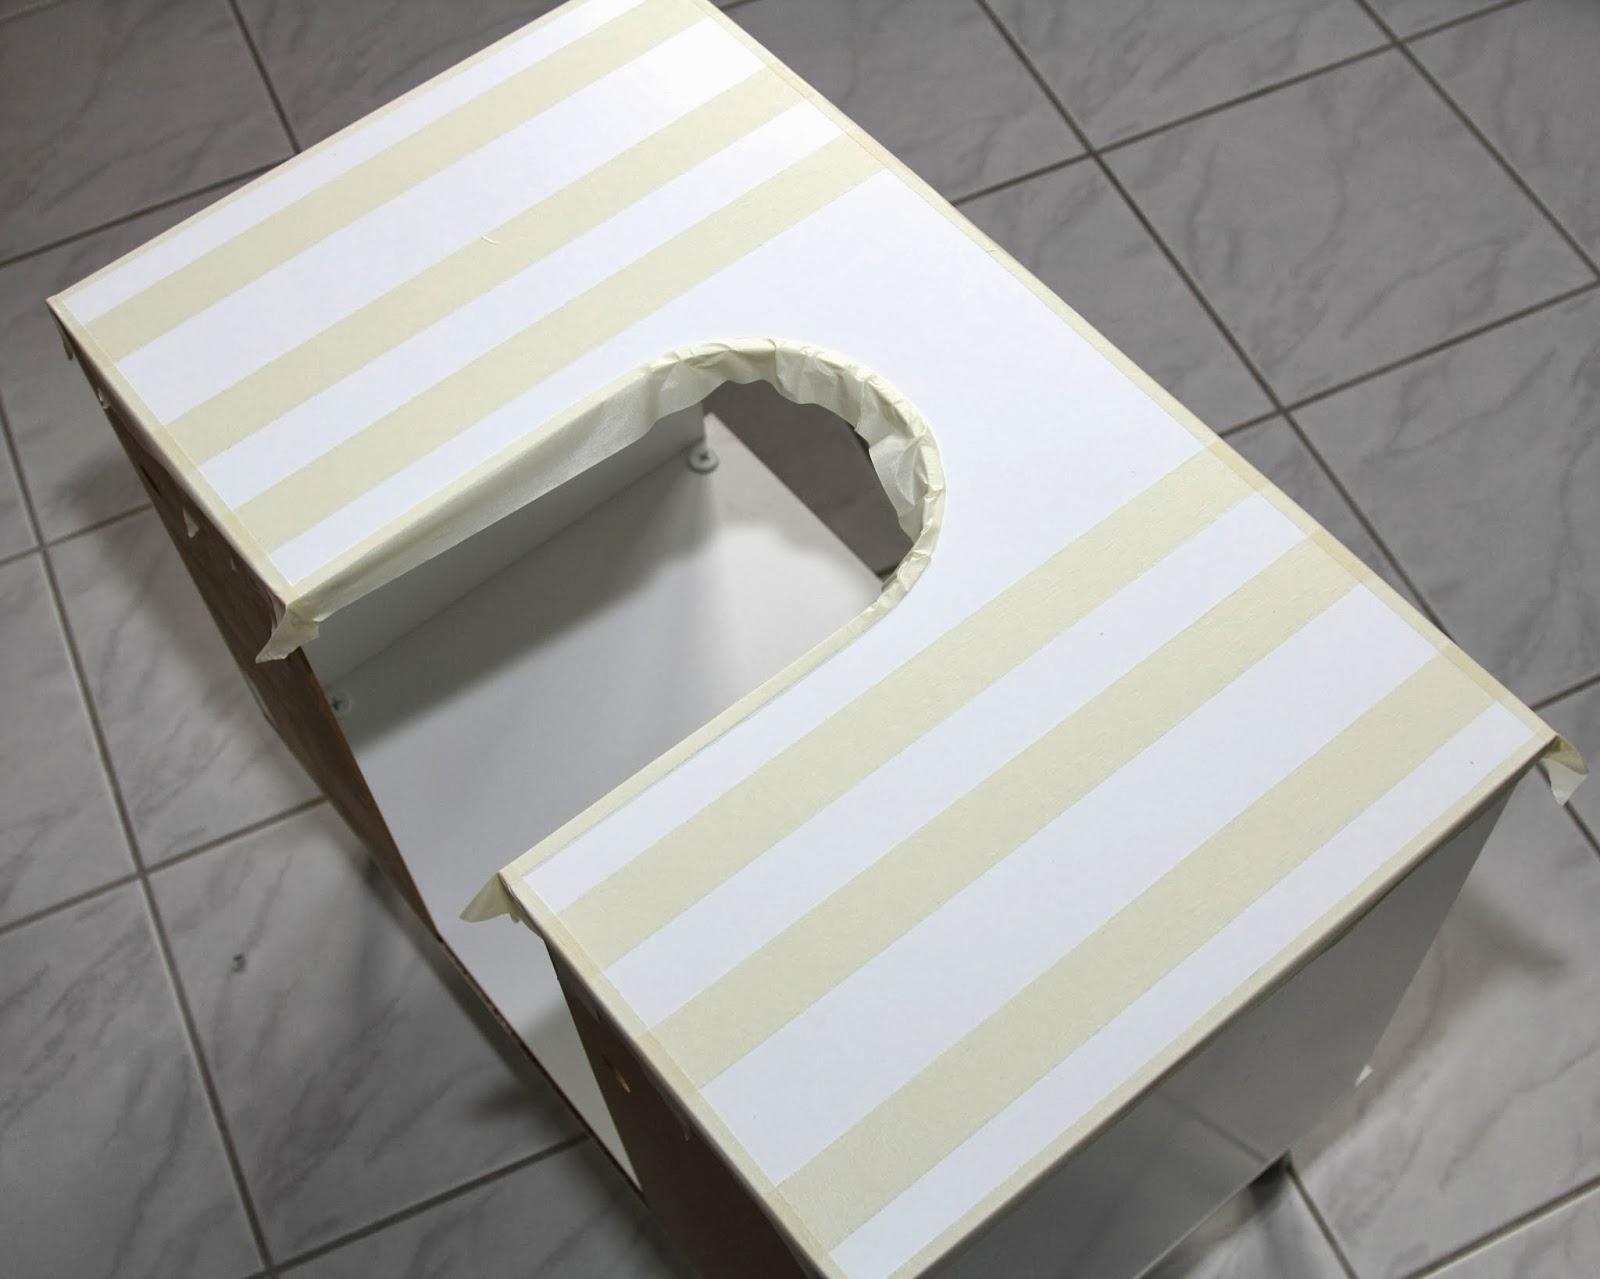 tschessilicious pimp your fullen mit marabu colour your dreams. Black Bedroom Furniture Sets. Home Design Ideas